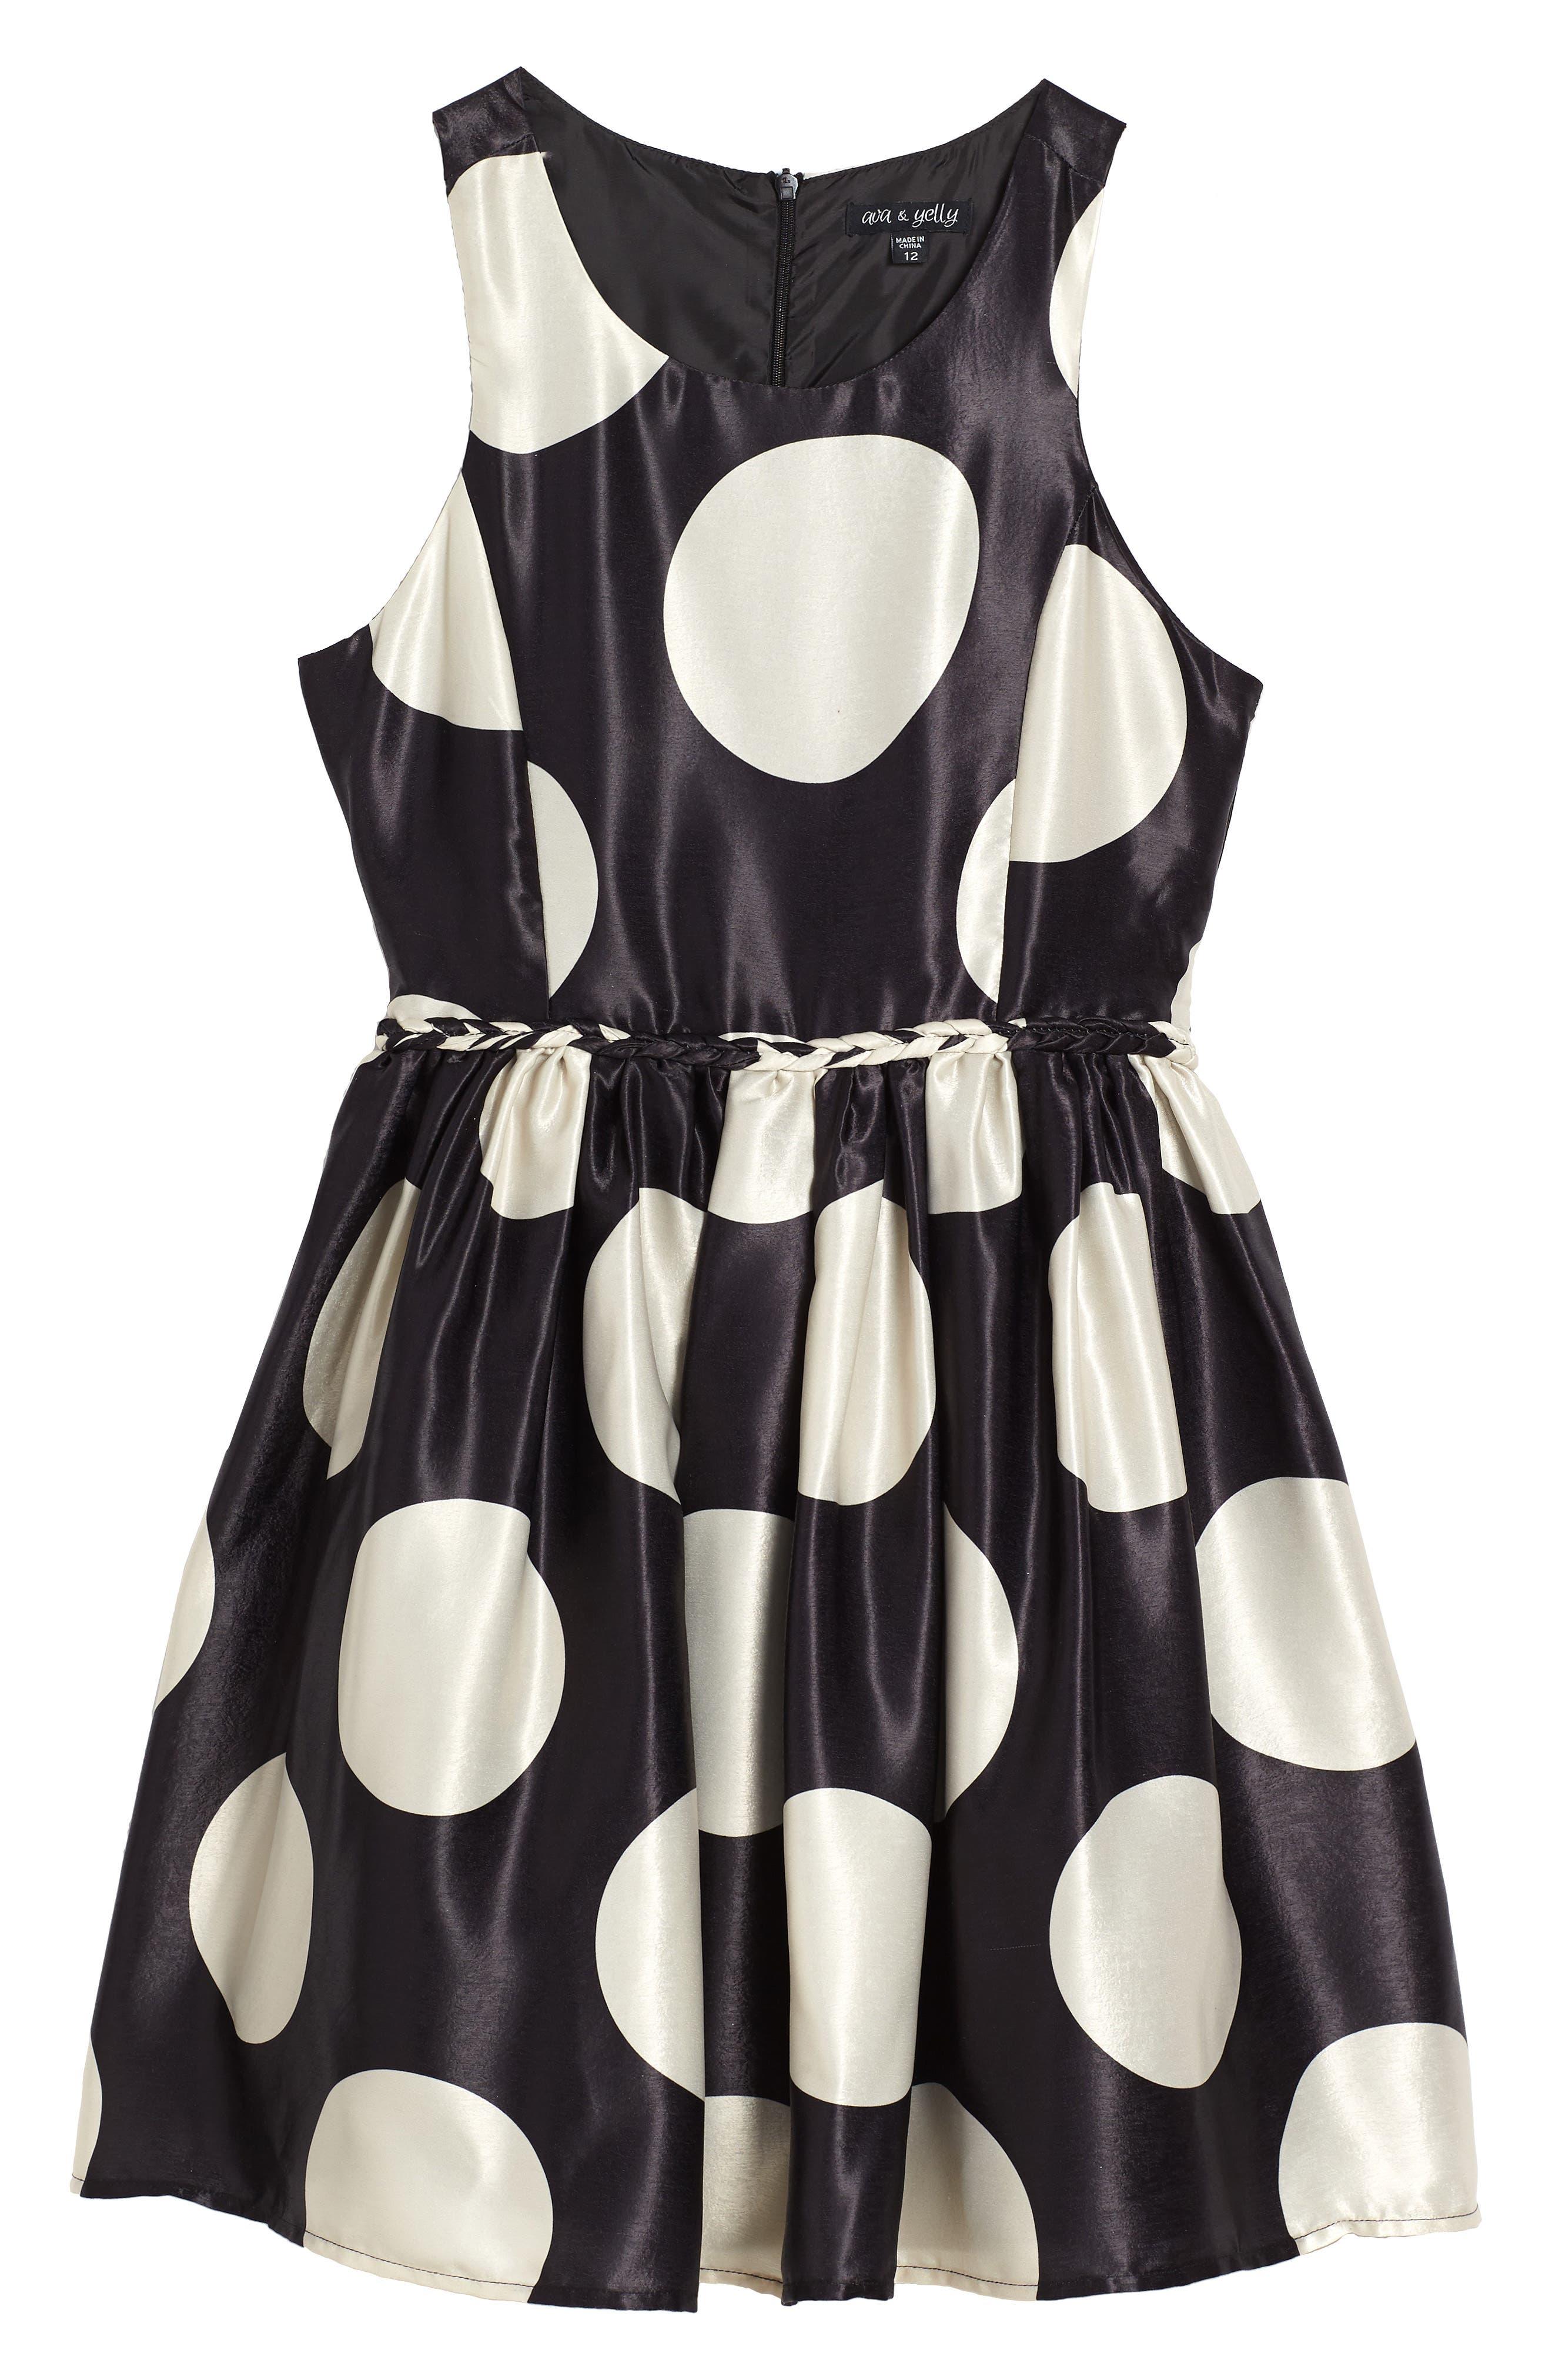 Braided Waist Fit & Flare Dress,                             Main thumbnail 1, color,                             Black/ Tan